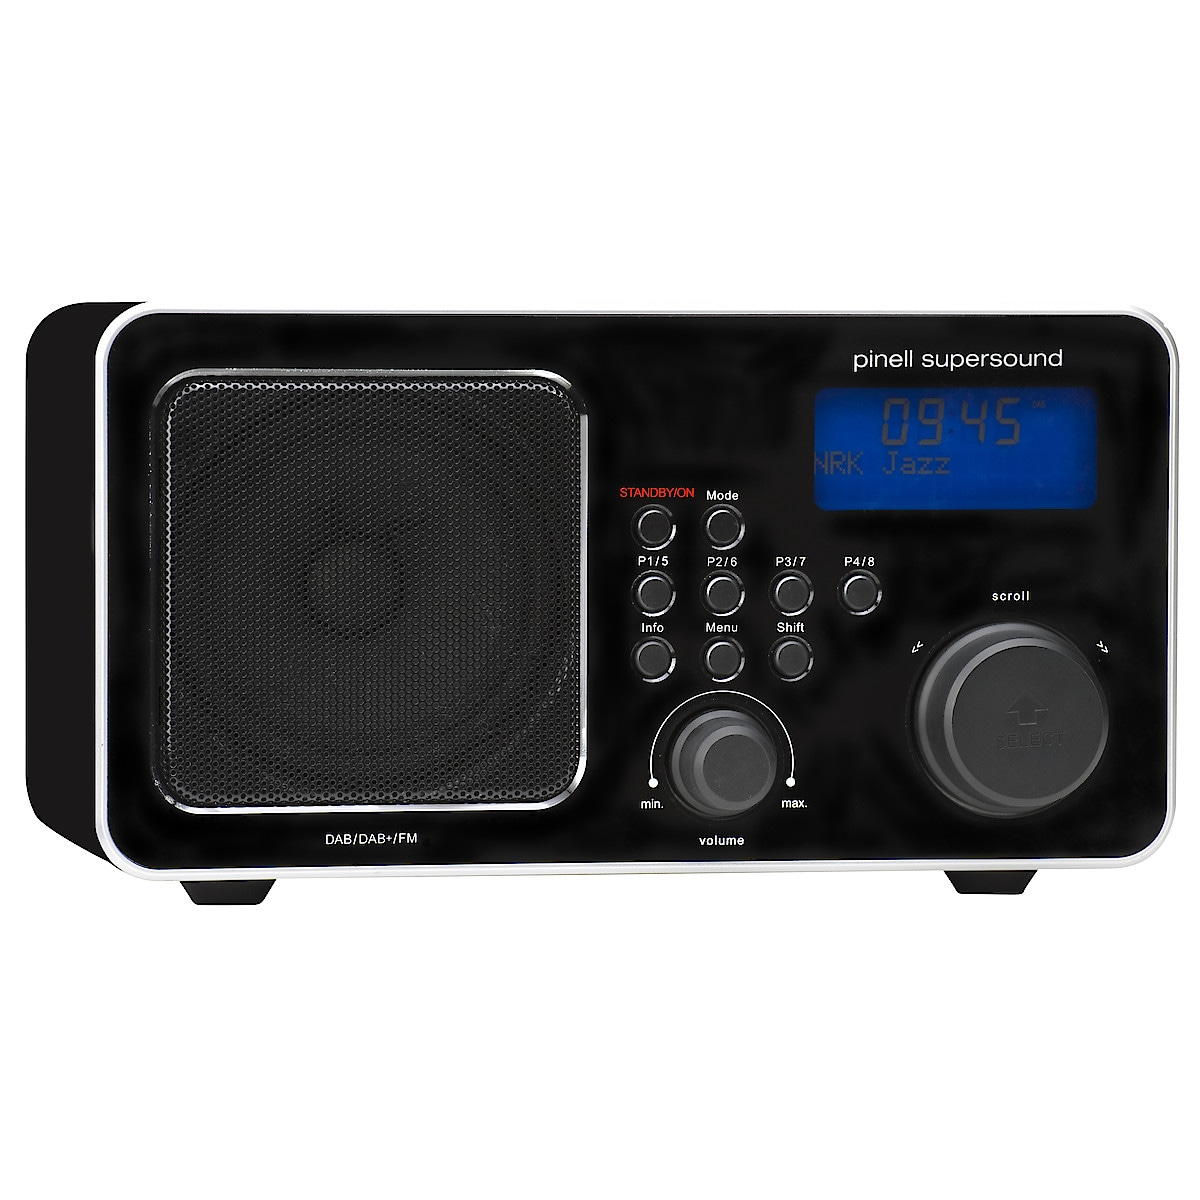 Pinell Supersound DAB/DAB+/FM-radio